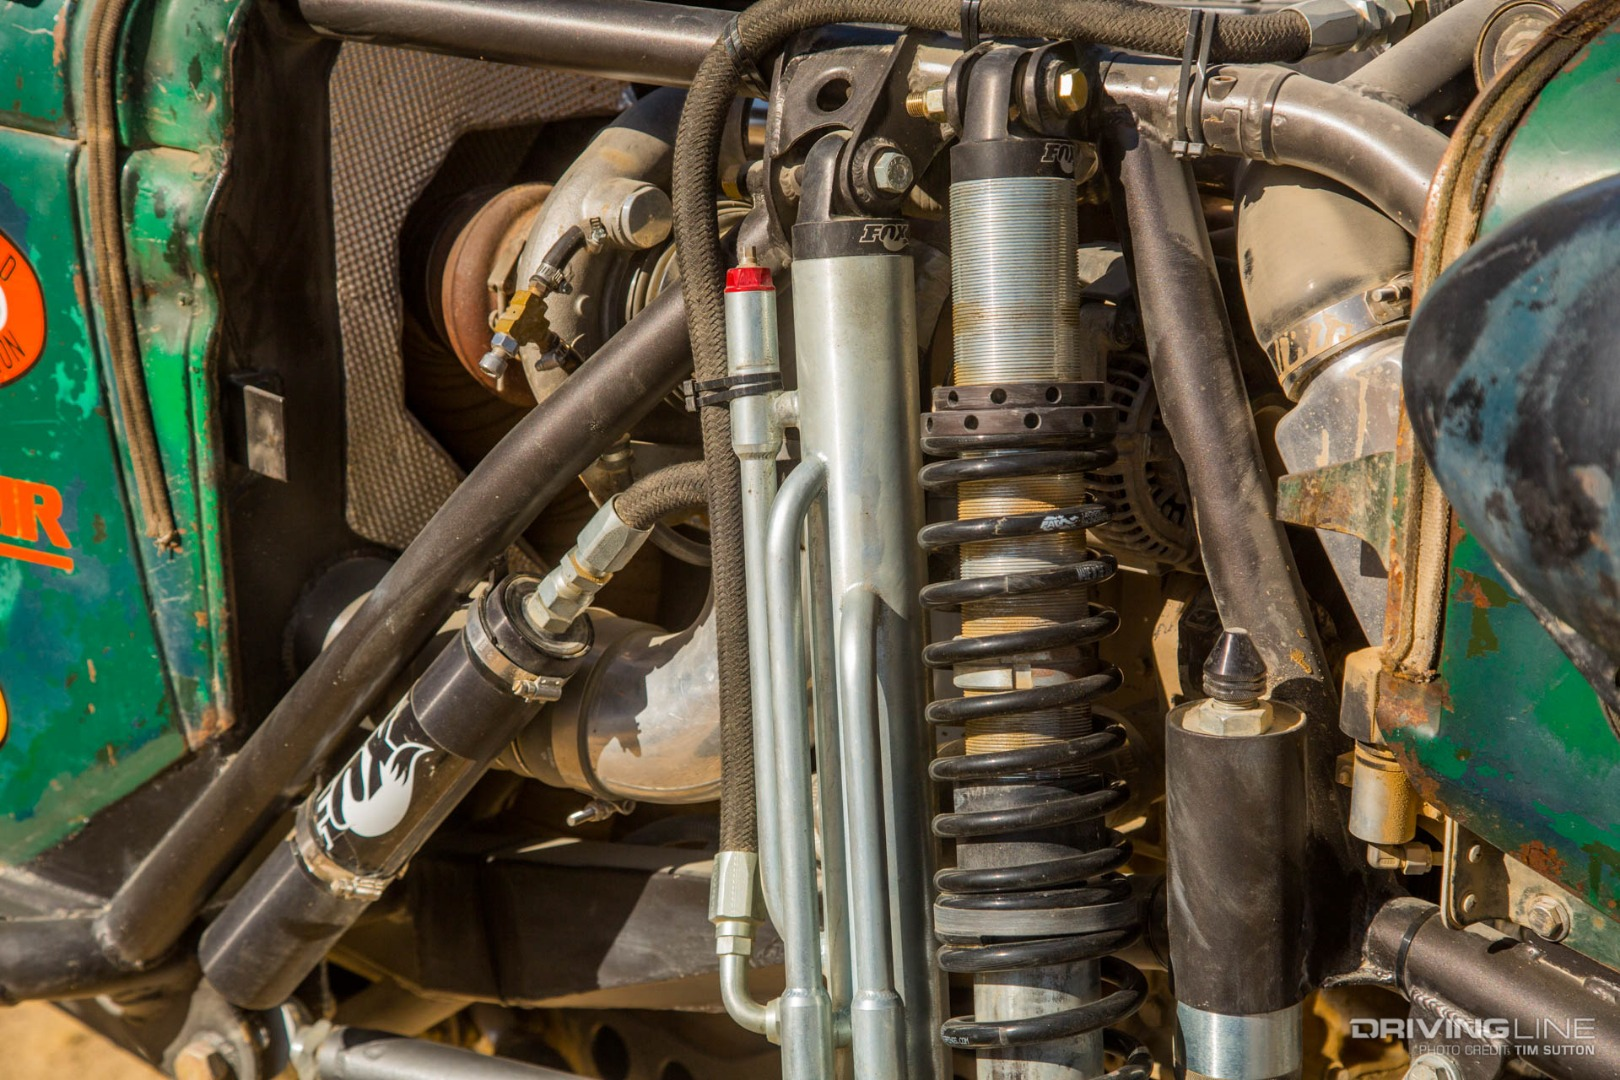 Cummins-Powered Wagon: A Closer Look at the RaceTractor Rock Crawler